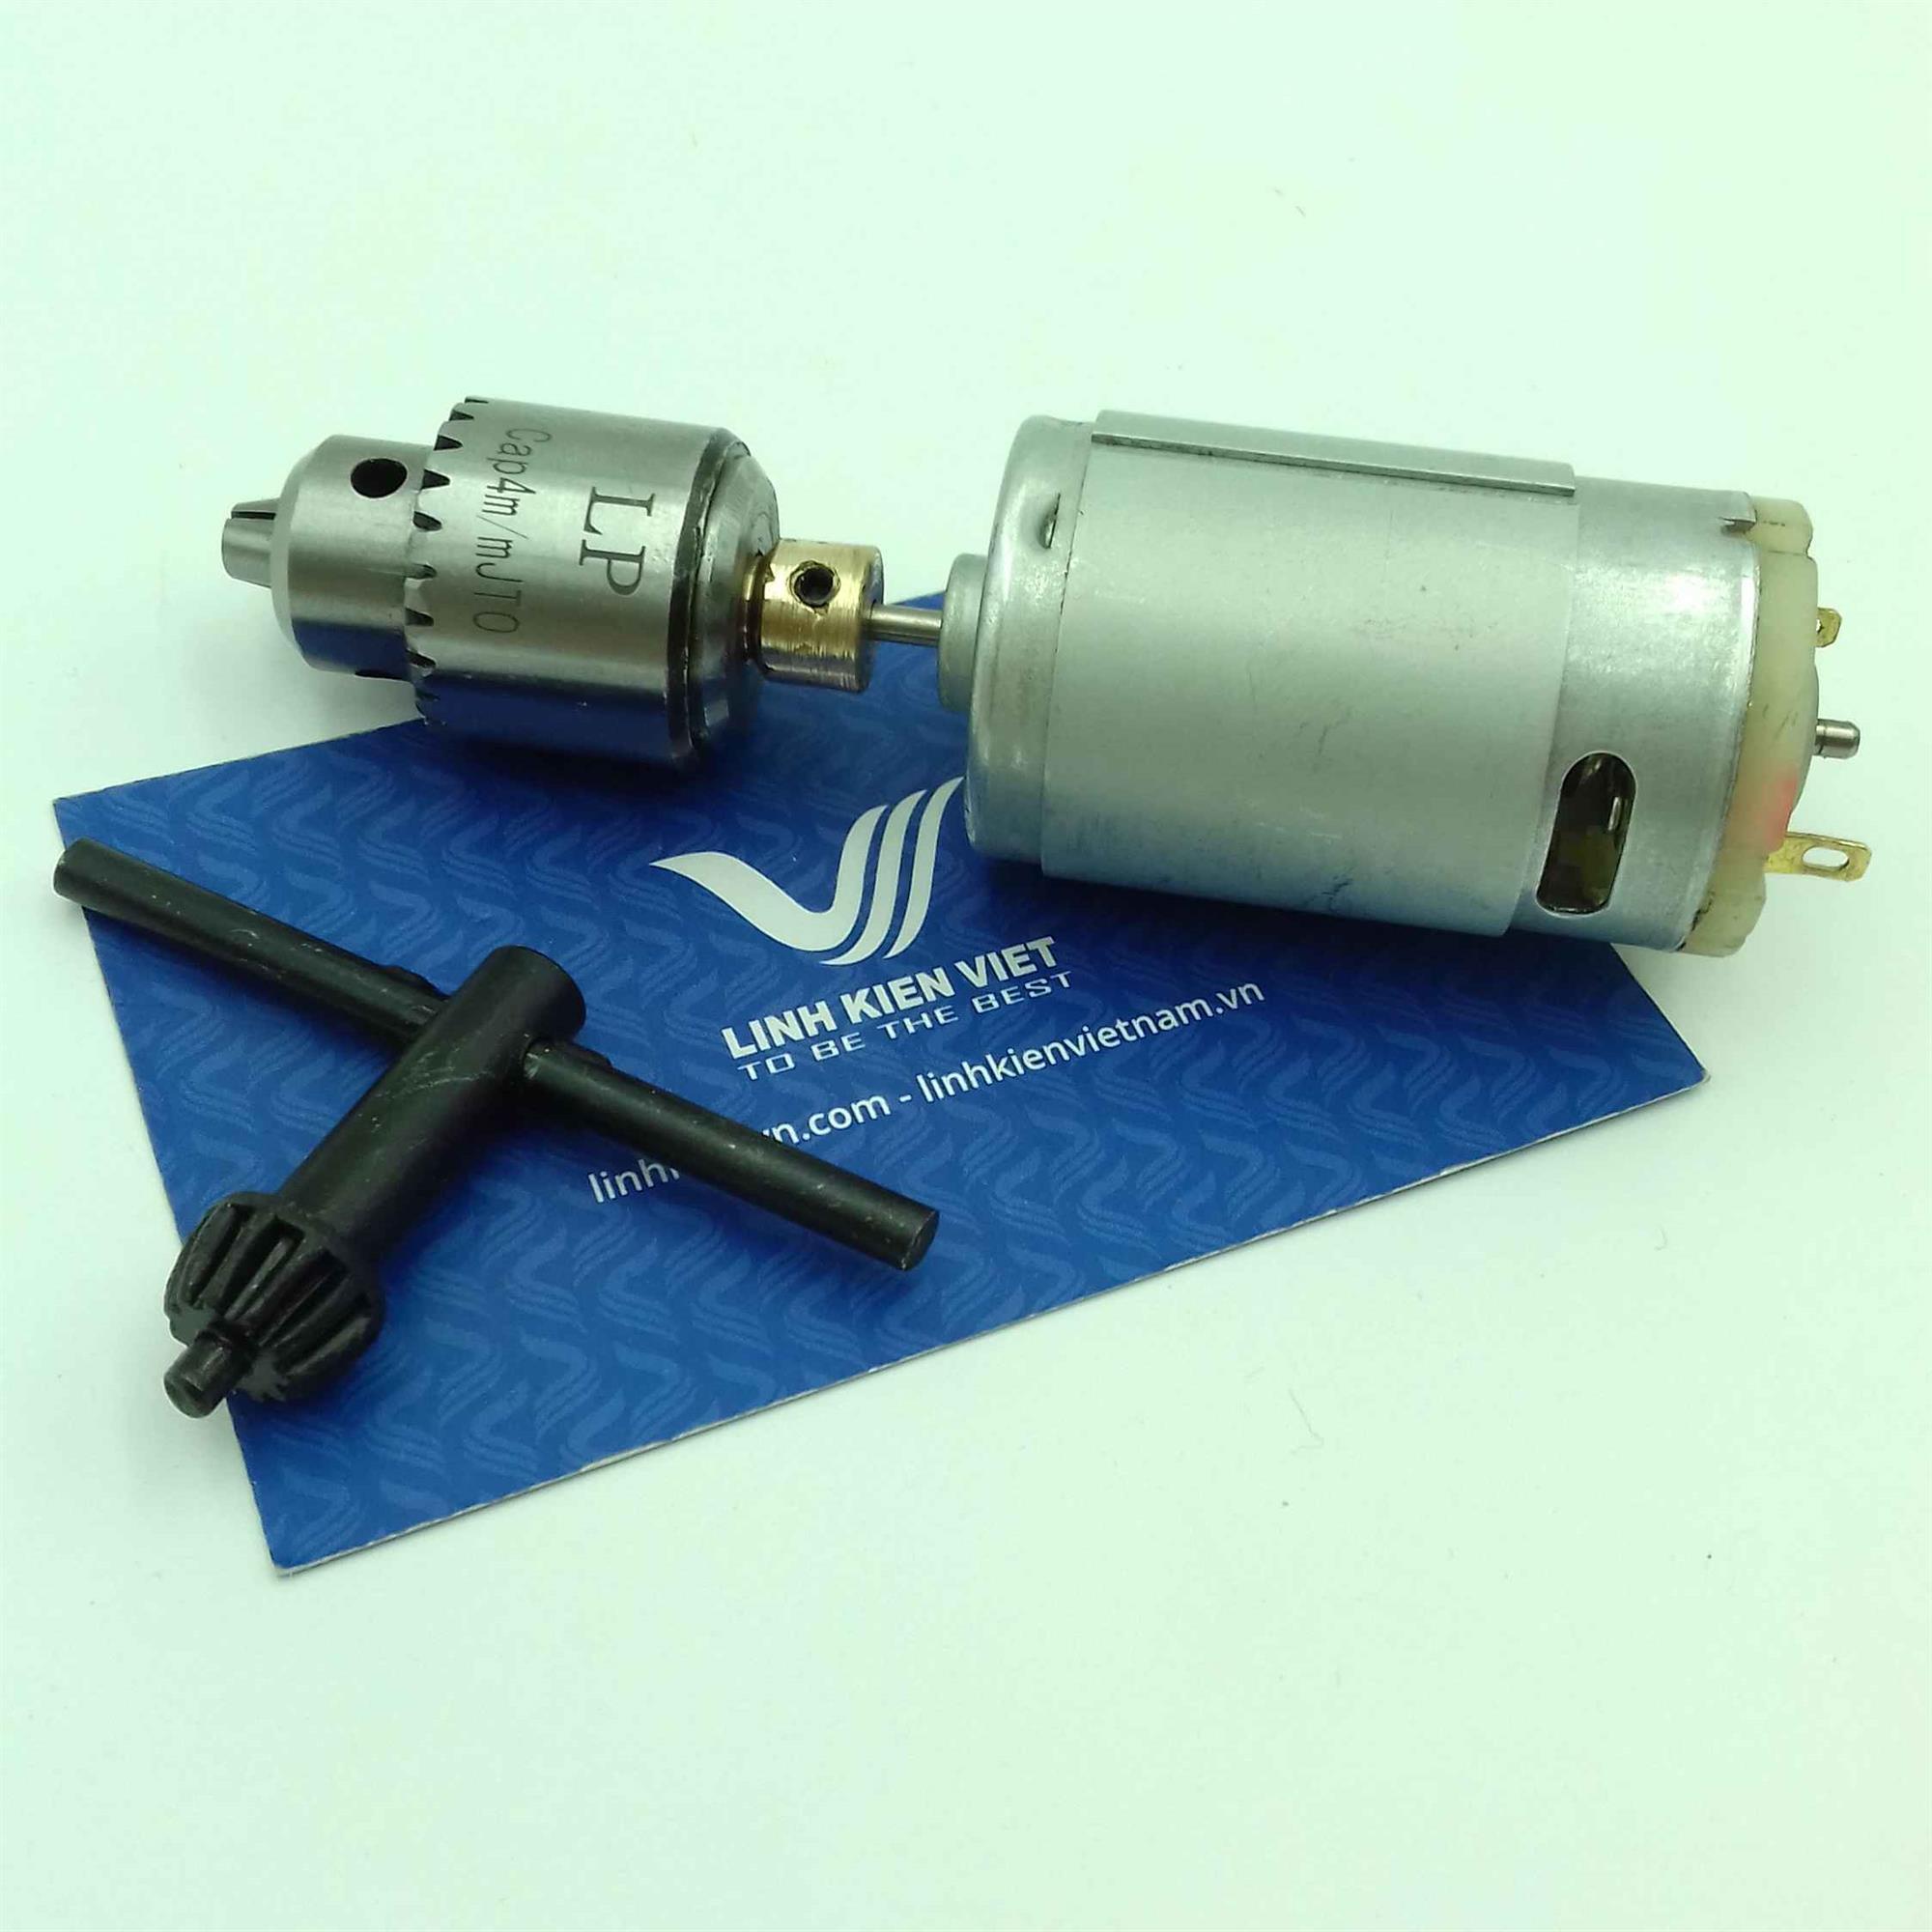 Motor khoan mạch 12V 0,3-4mm/ Khoan tay DC 12V / Khoan mạch DC 12V -